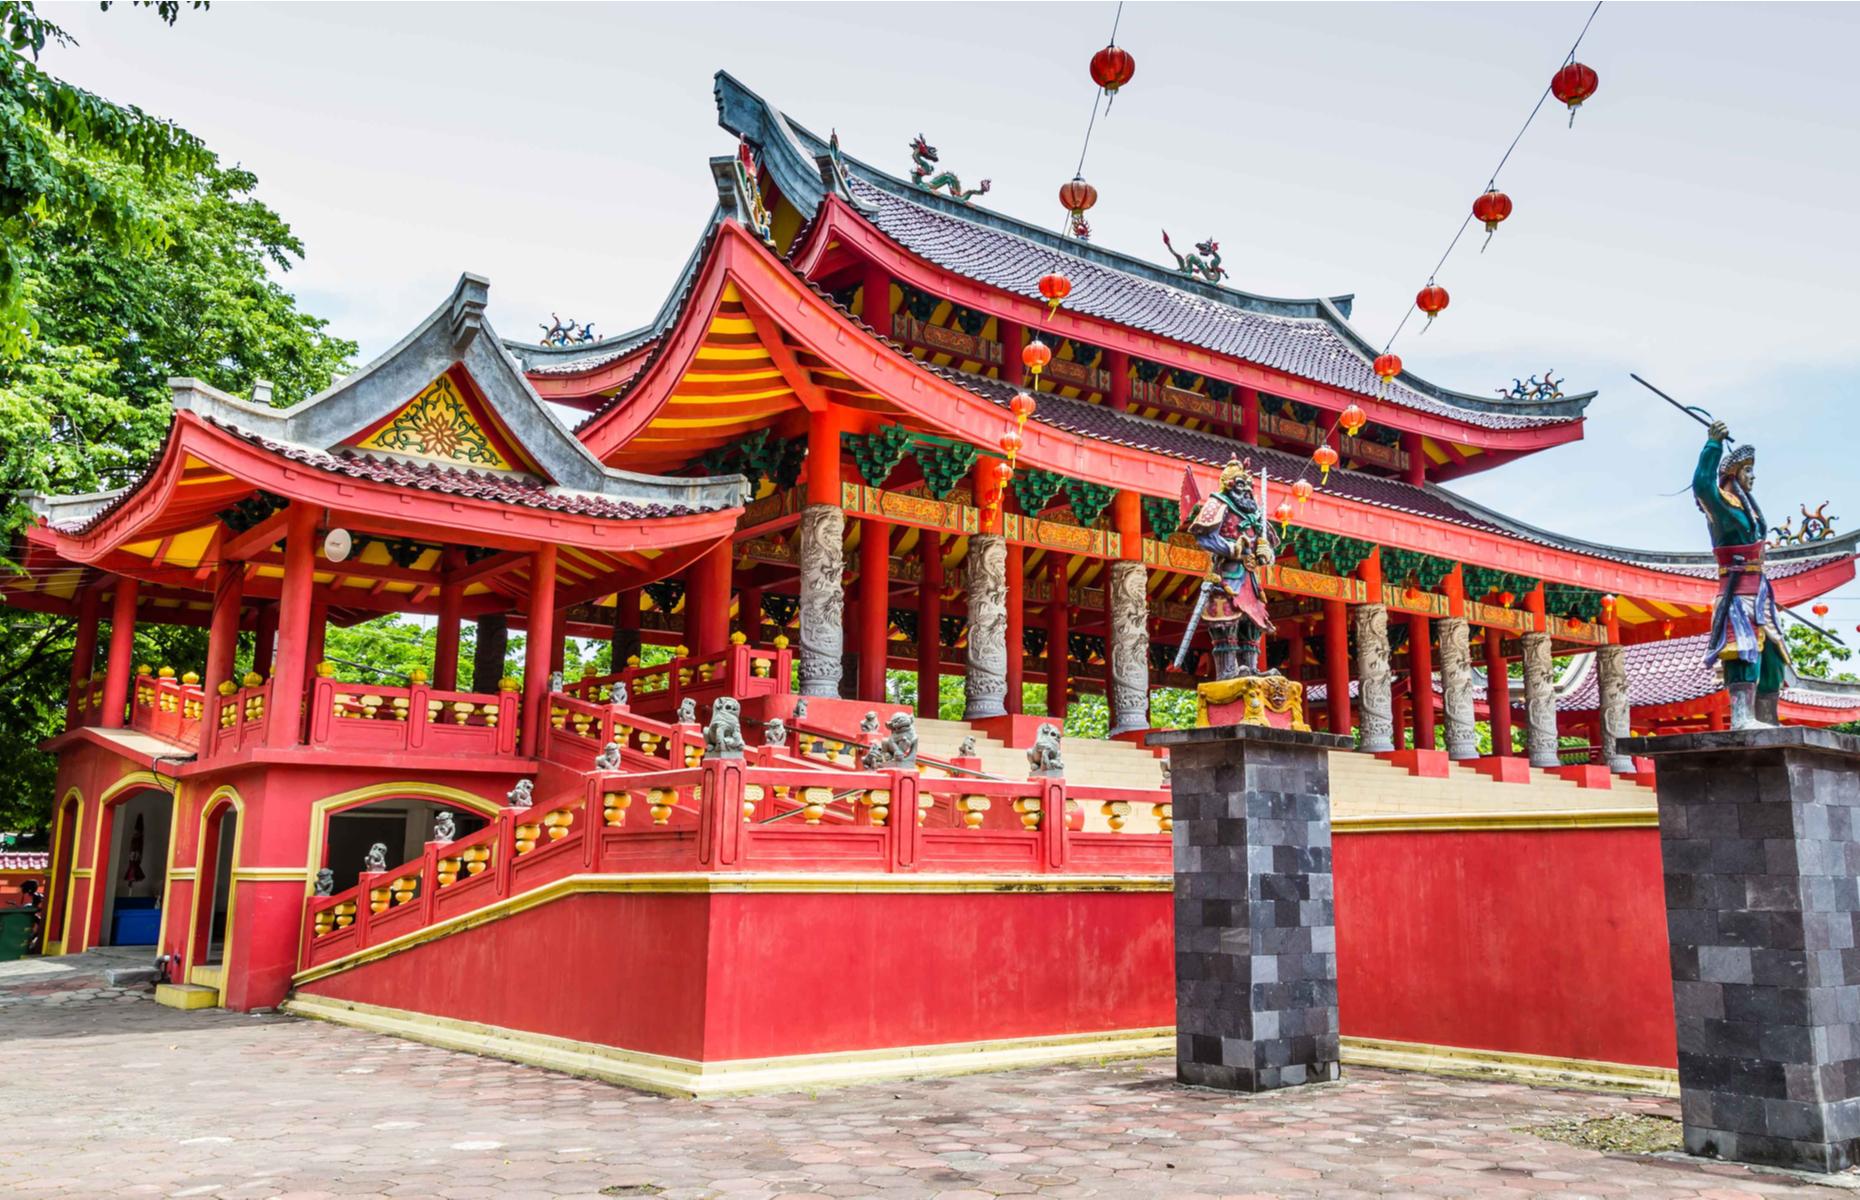 Sam Poo Kong temple, Semarang (Image: HildaWeges Photography/Shutterstock)